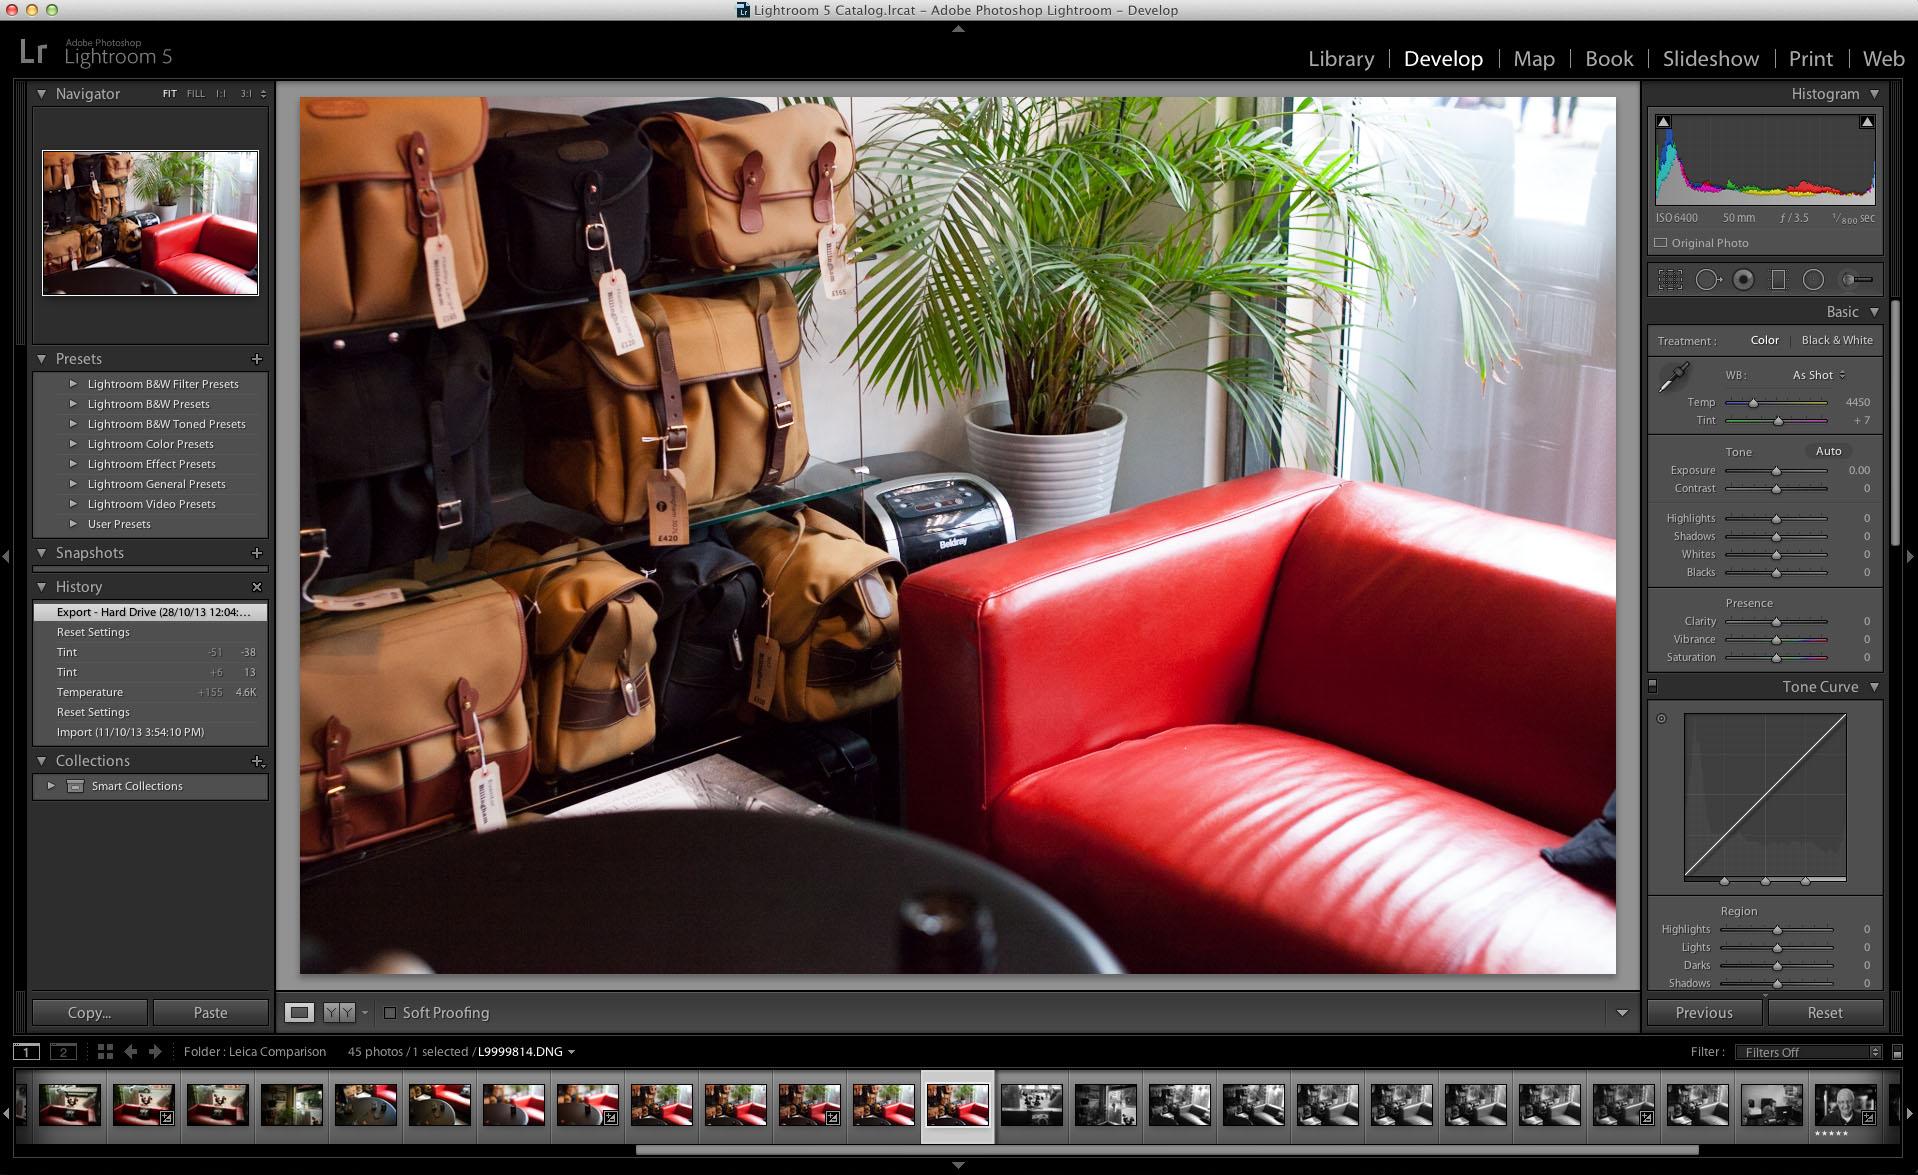 Apple Photos Vs Adobe Lightroom